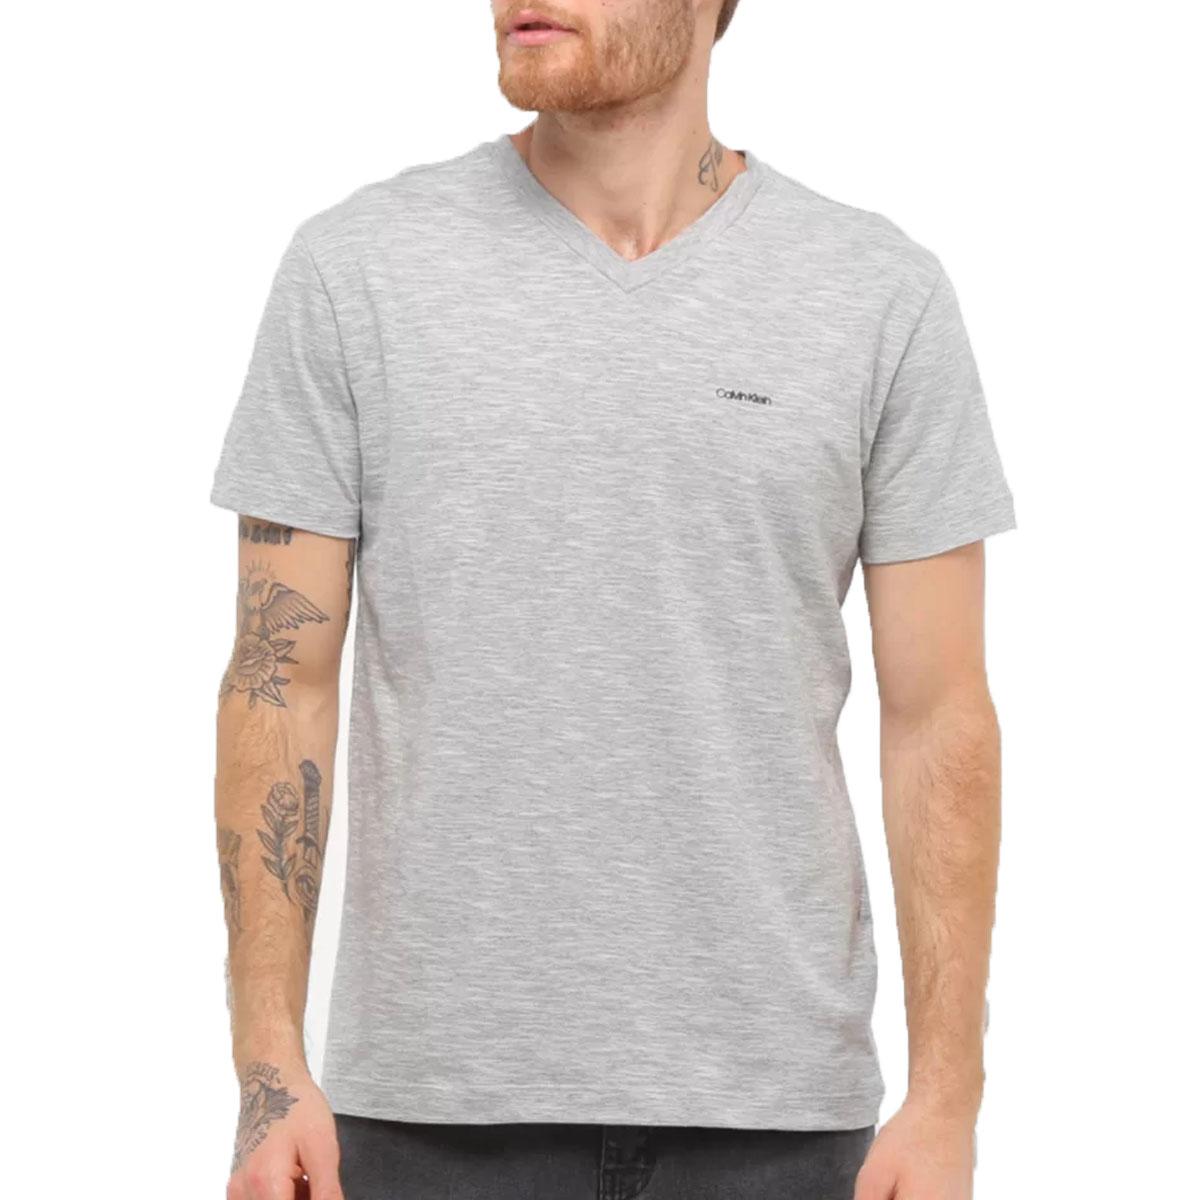 Camiseta Calvin Klein Slim Flame Gola V Cinza Mescla